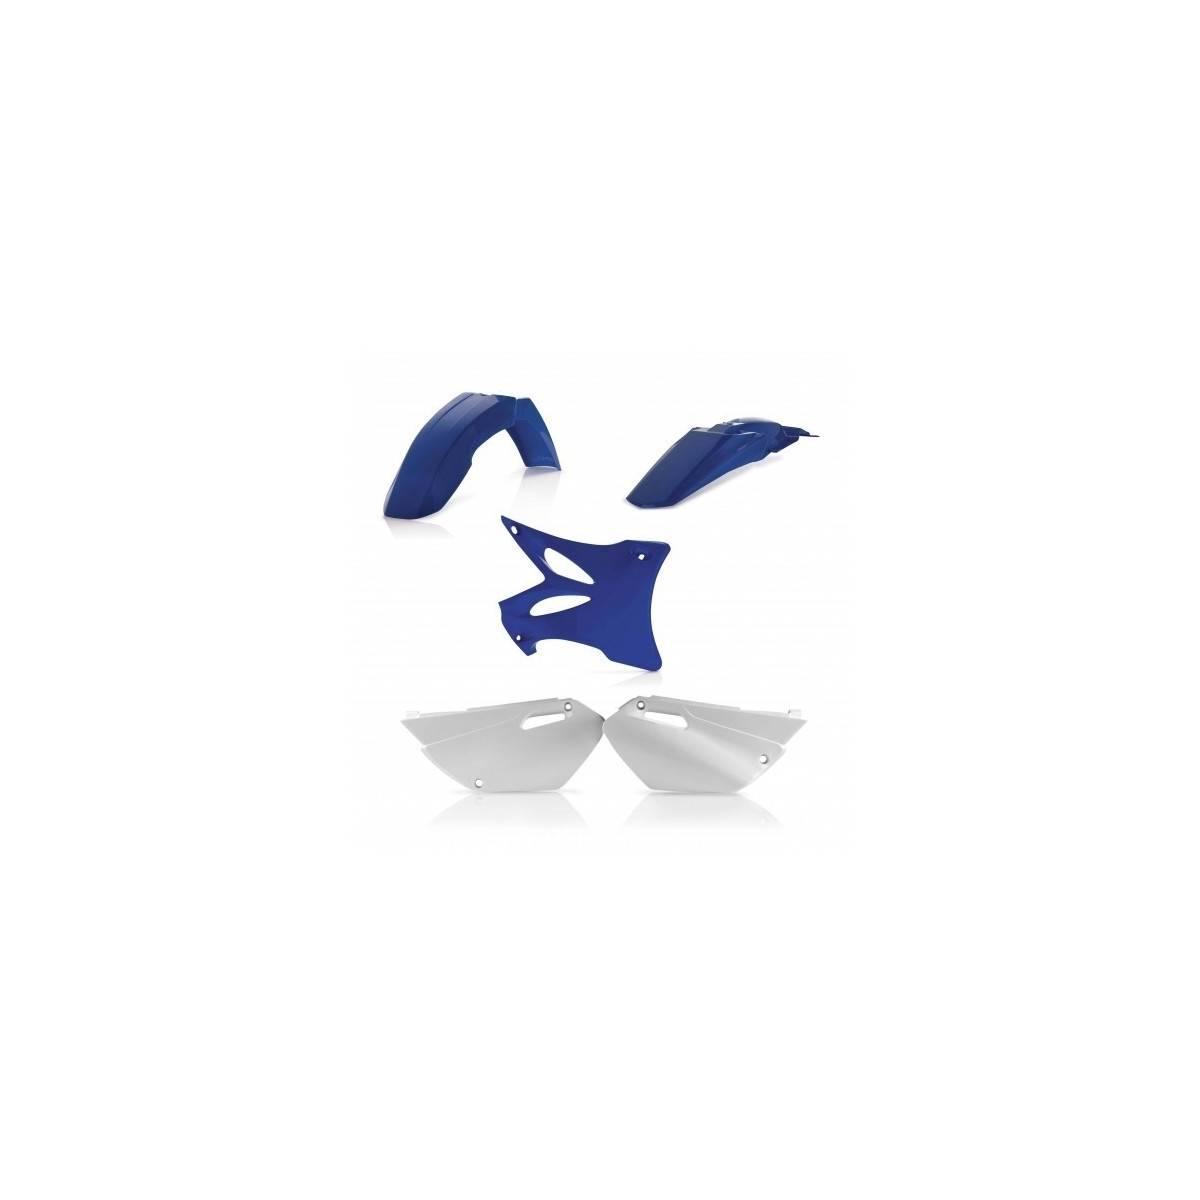 0023090-040 - Kit Plasticos Wrf 450 18 Azul